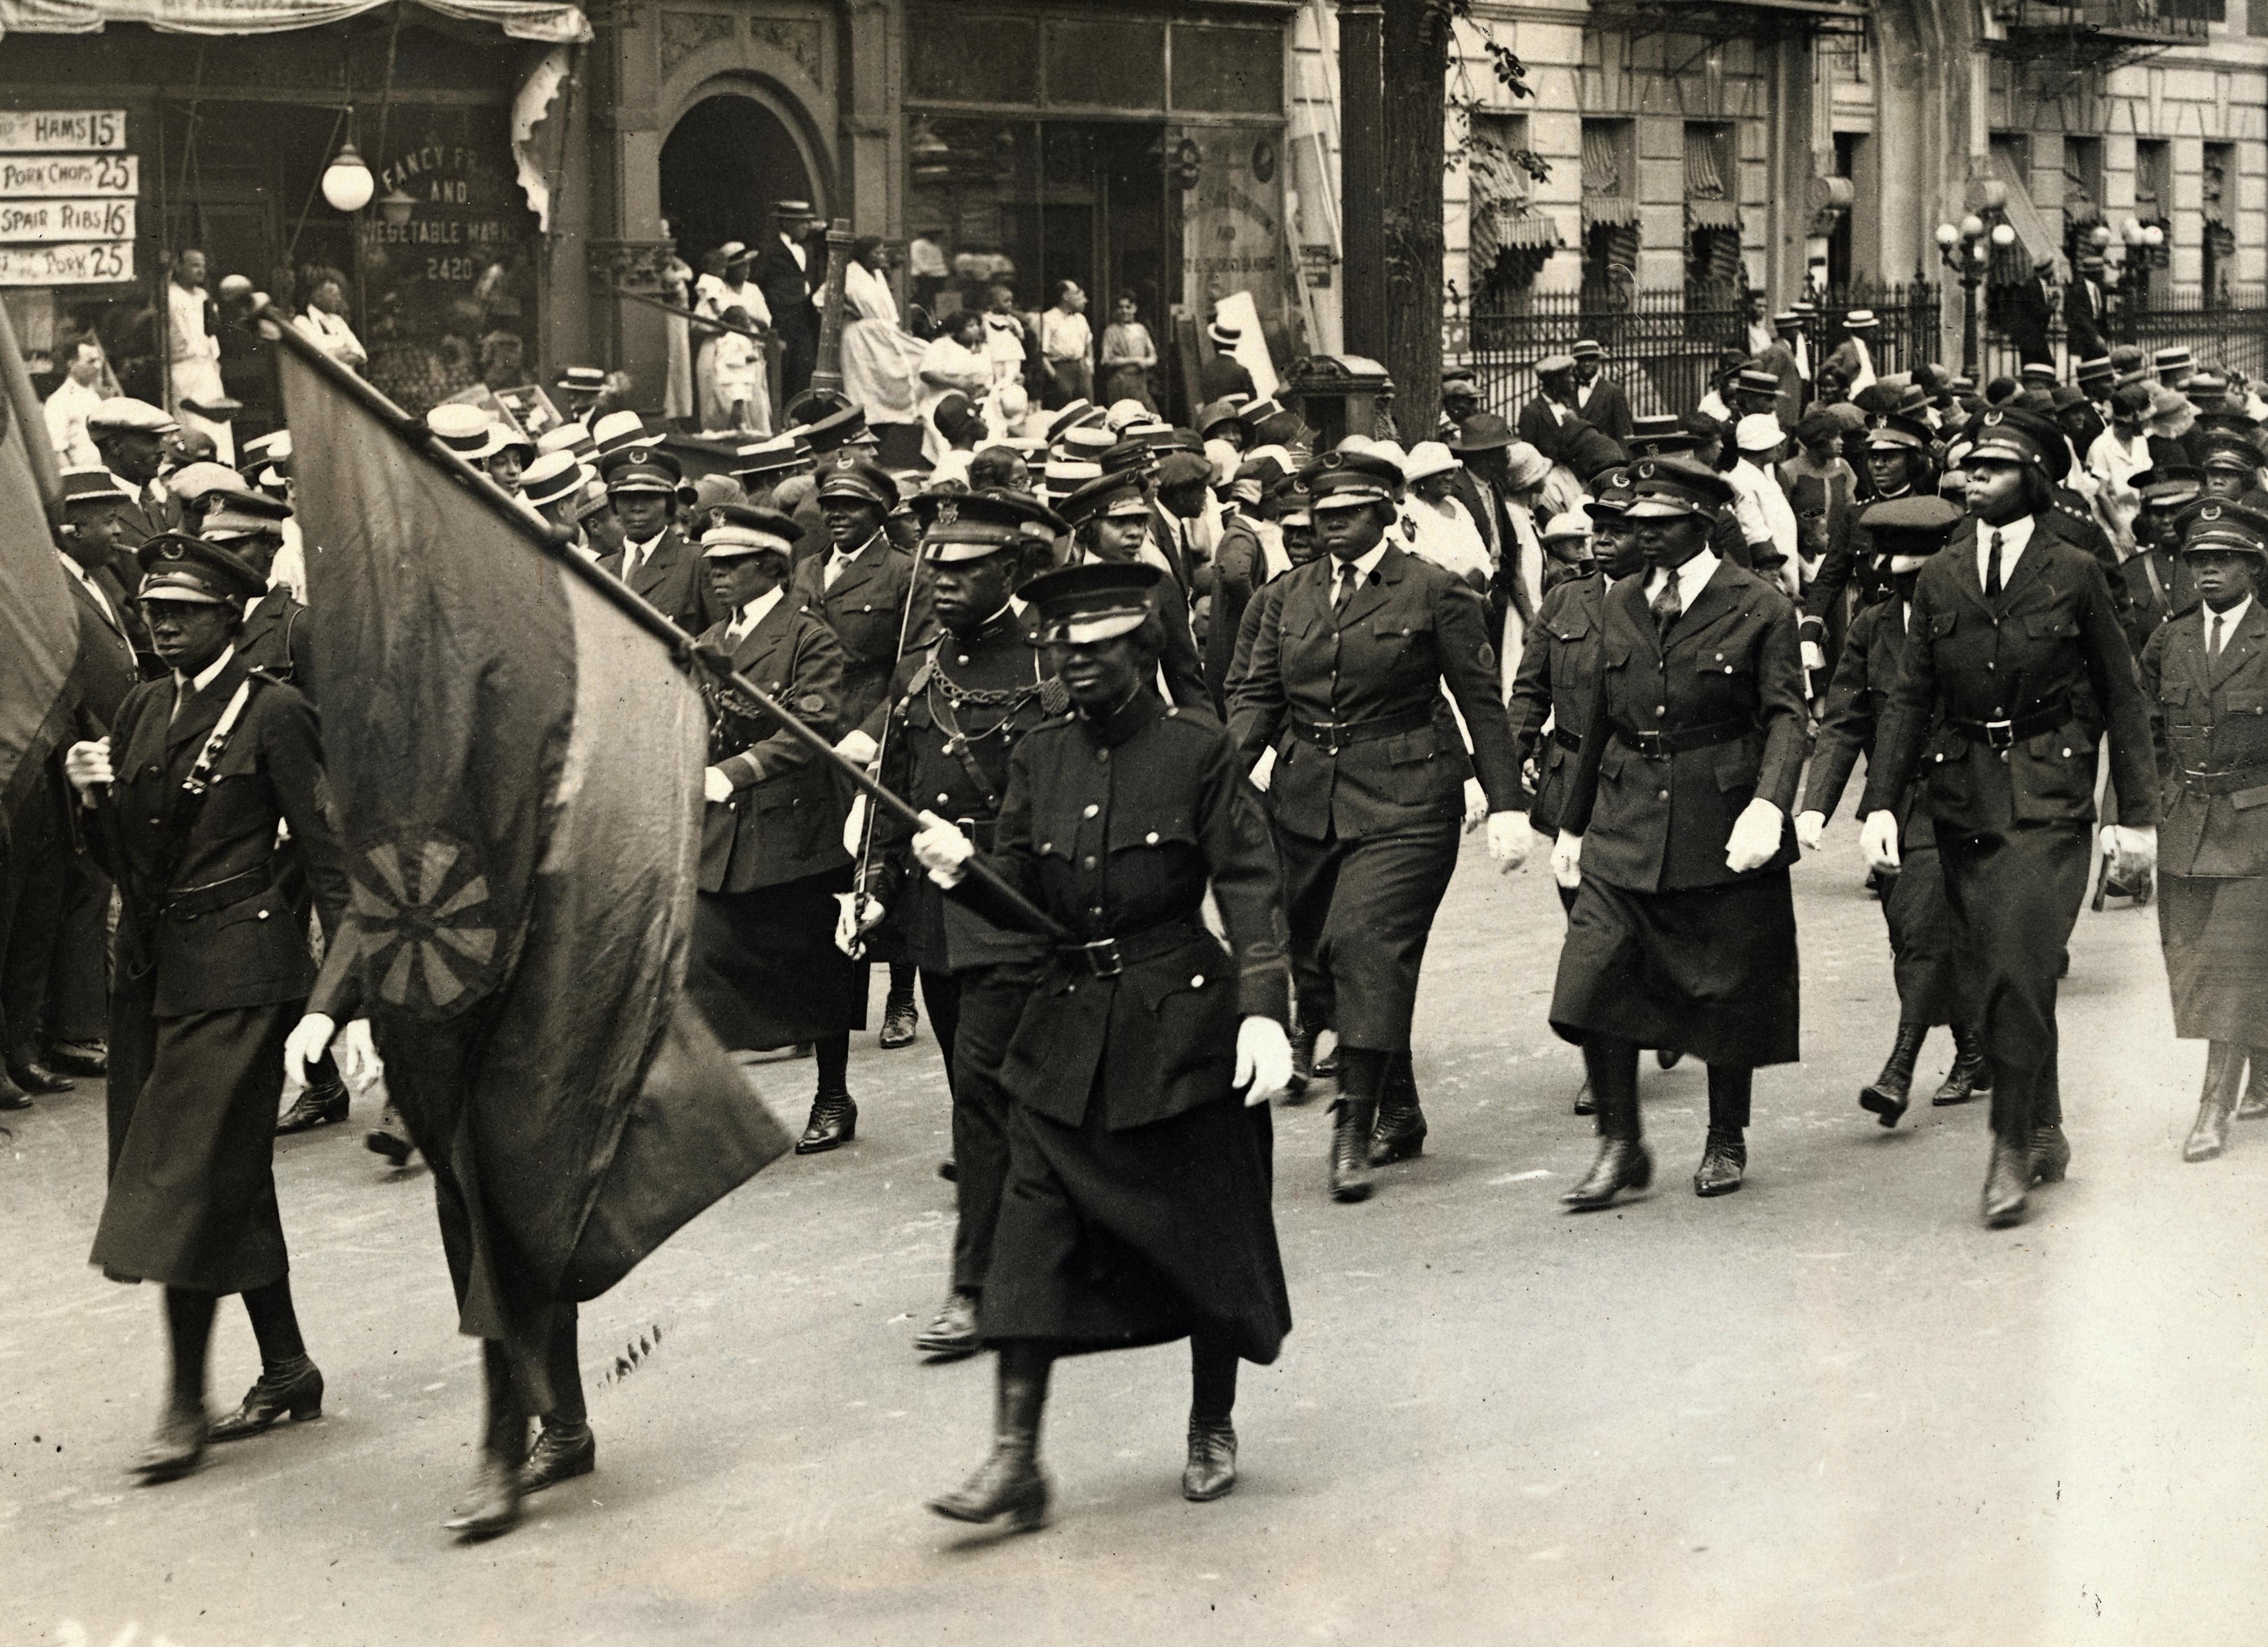 Centering Black Nationalist Women's Ideas: An Author's Response